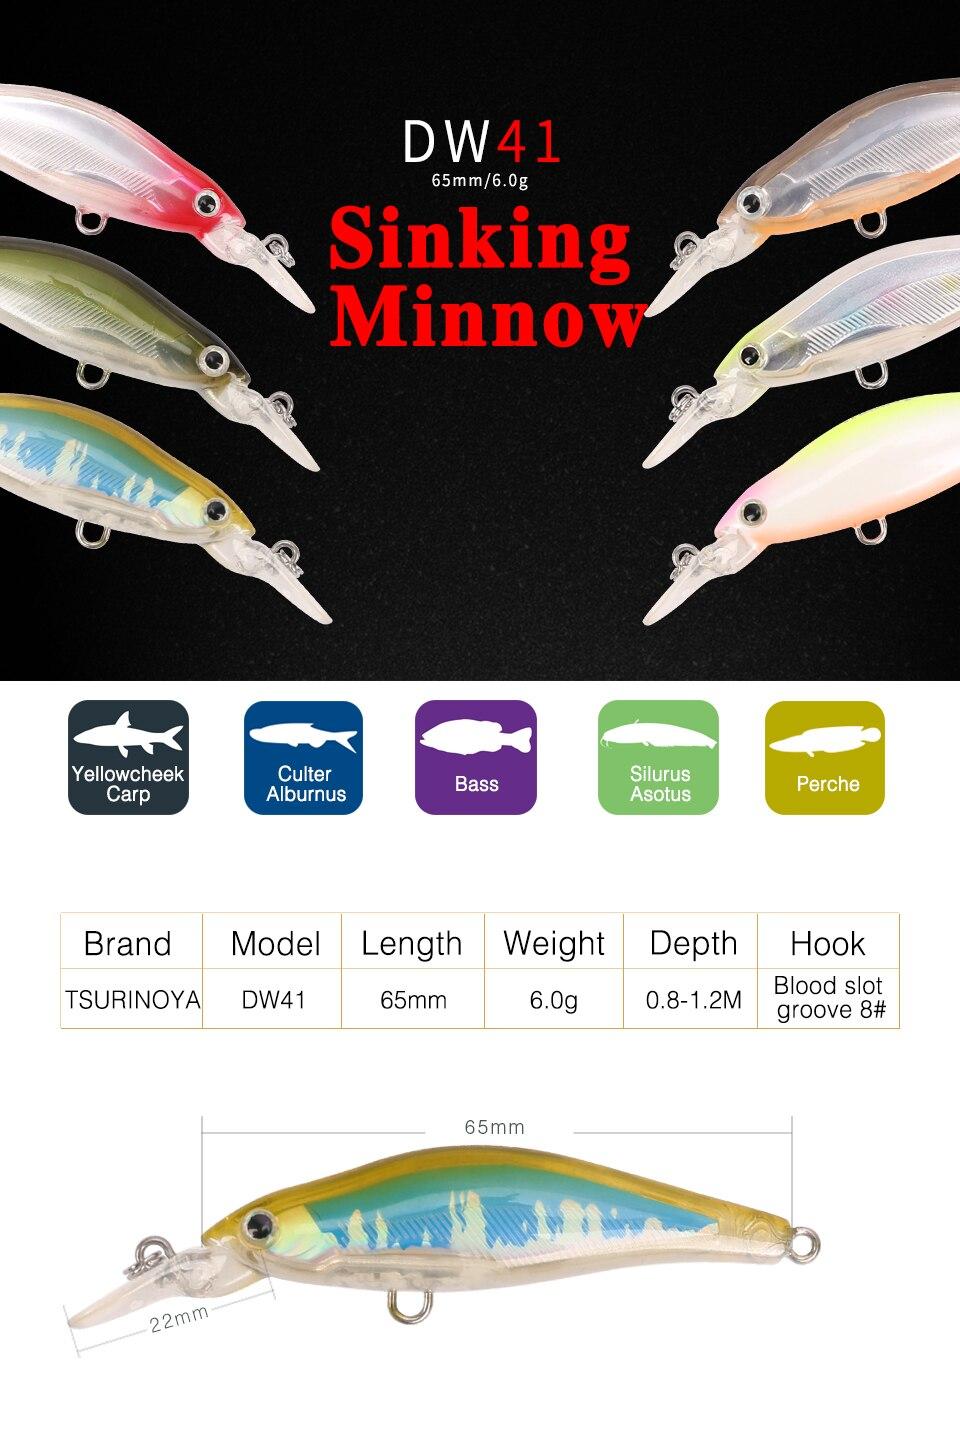 3 PAC Personalizado Pintado Mega Bass Vision 110 Pro Isca Artificial Isca De Pesca De Inverno Azul